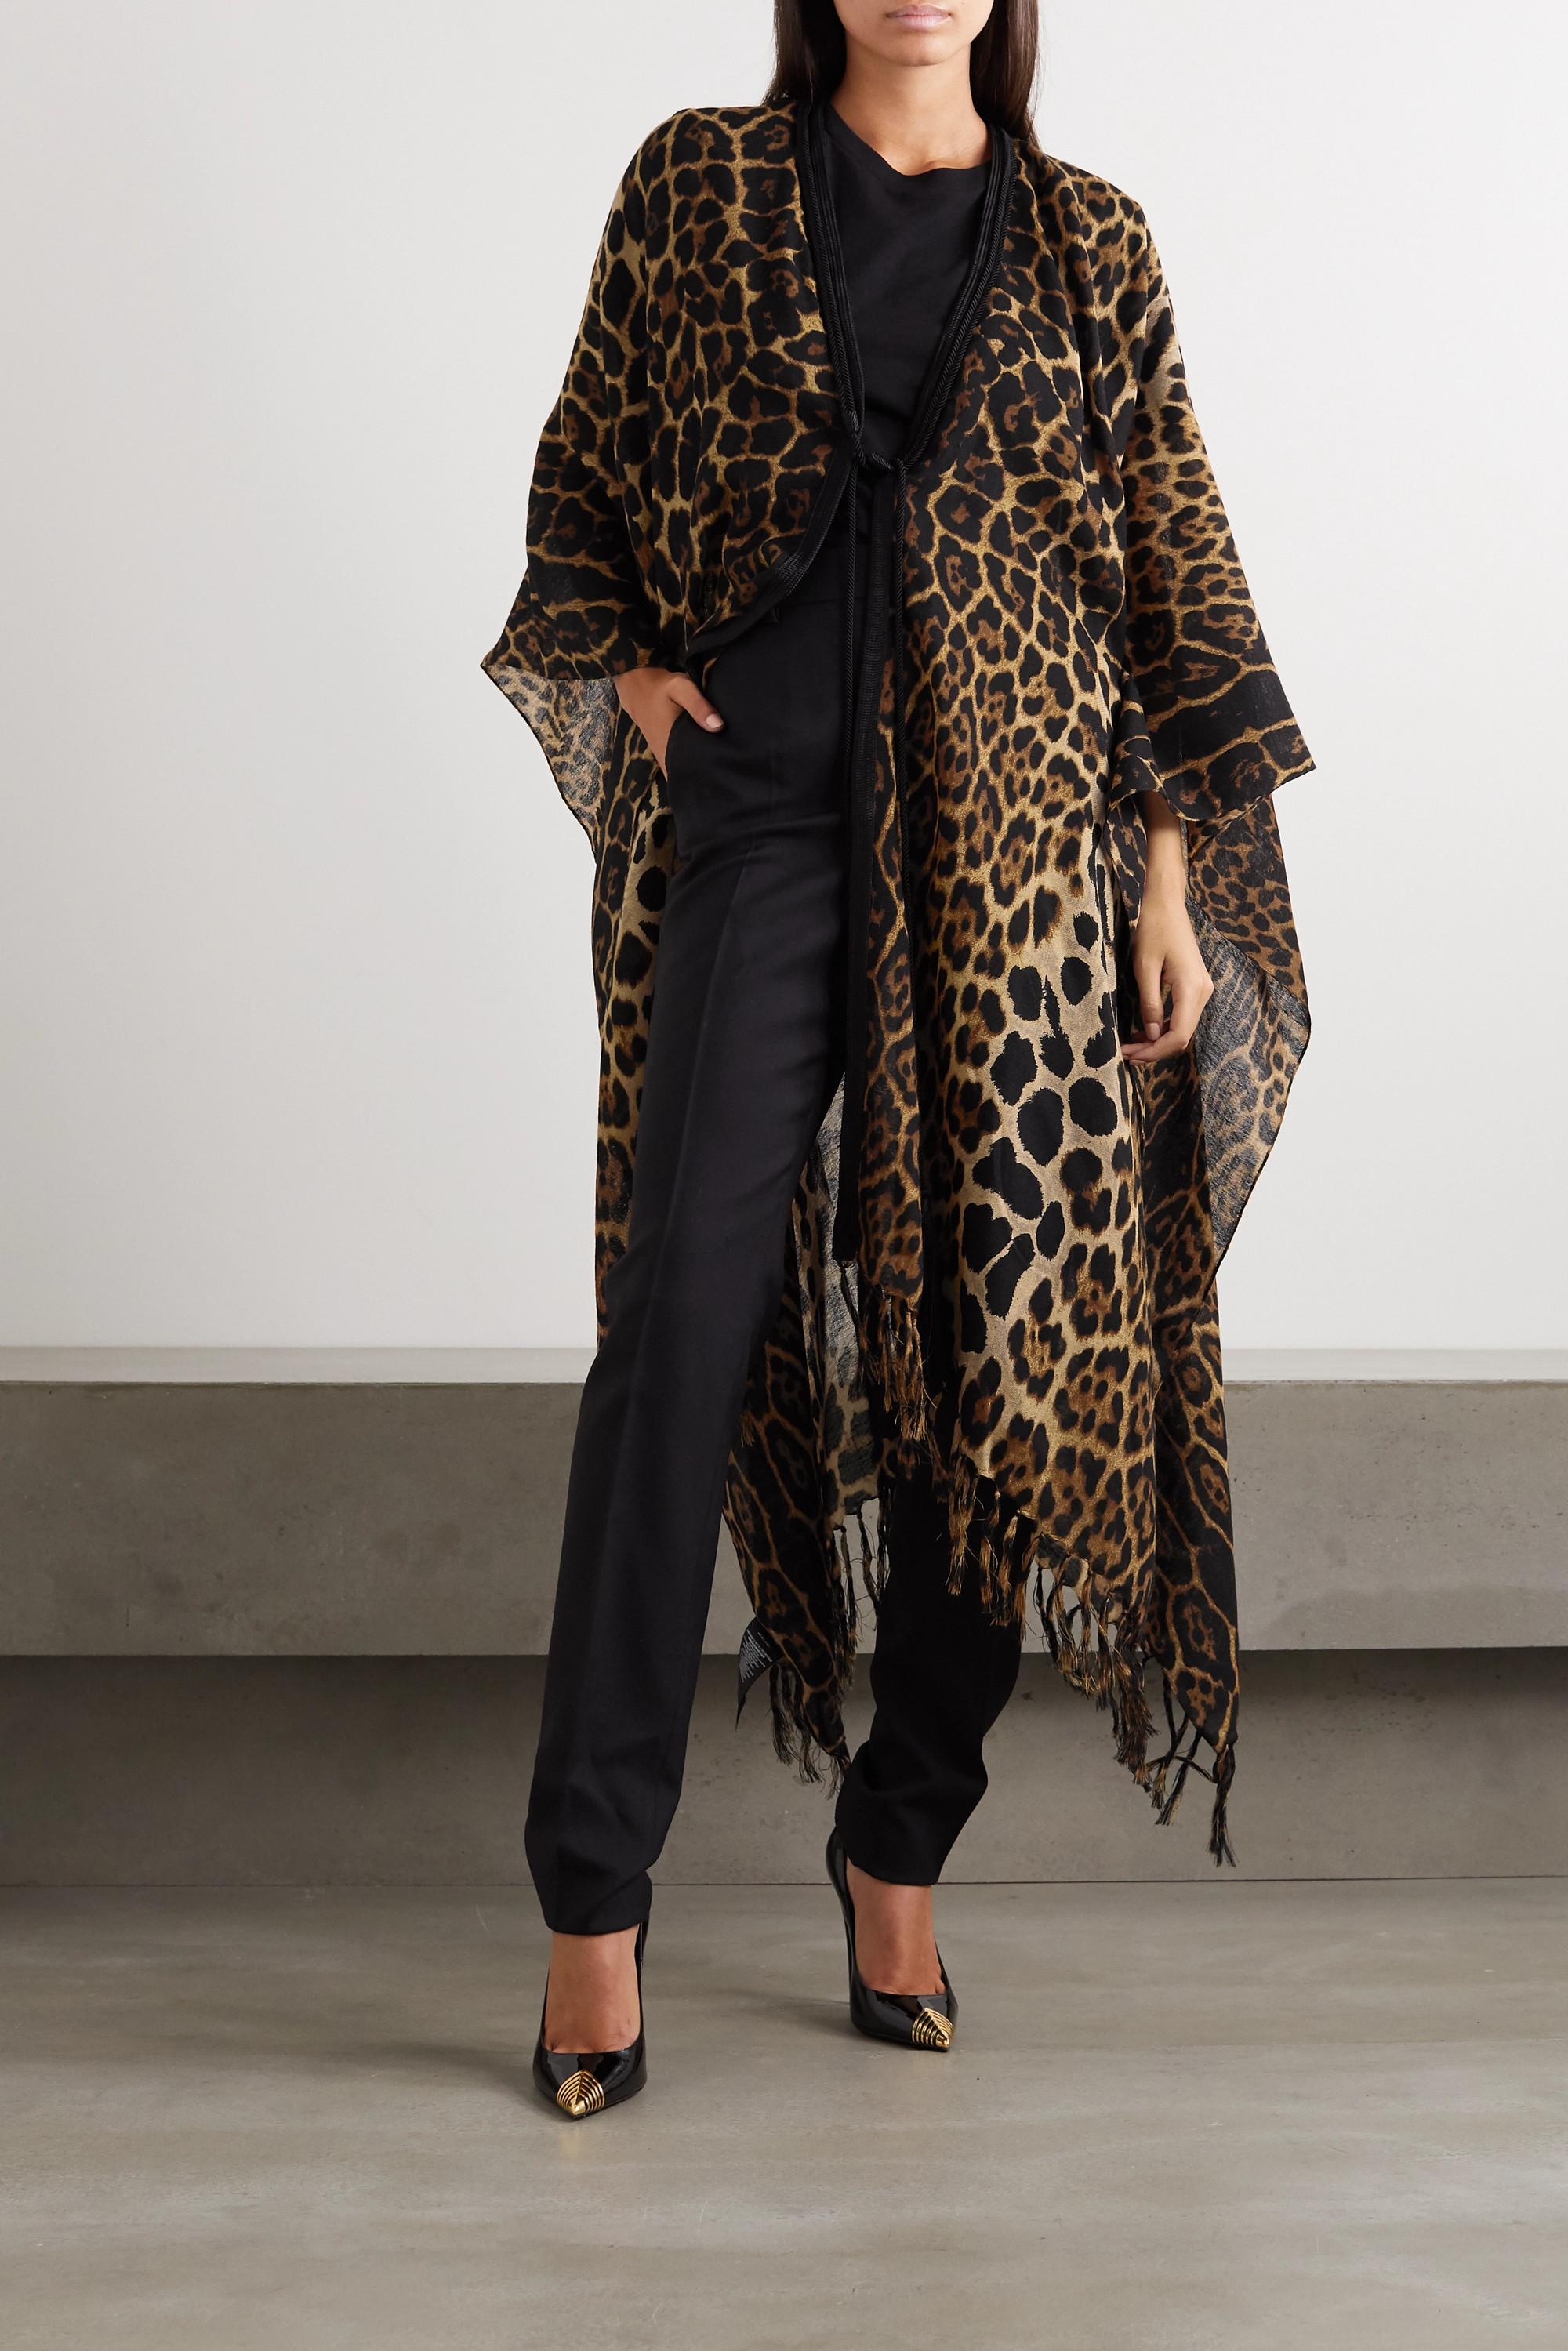 SAINT LAURENT Fringed leopard-print wool wrap